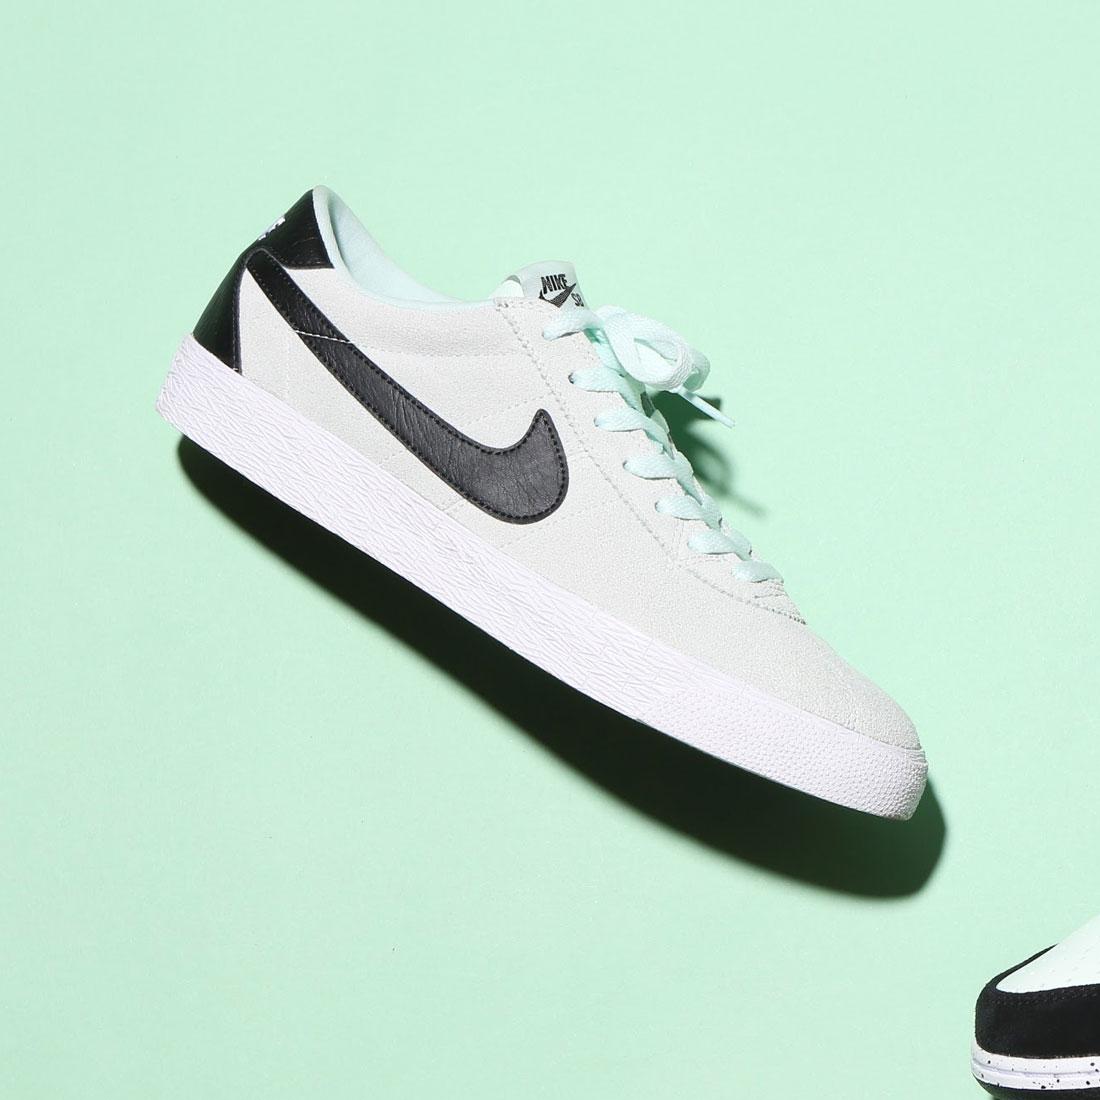 sports shoes 53cea 55b5f NIKE SB BRUIN ZOOM PRM SE (Nike Nike SB bulldog in zoom premium SE) (BARELY  GREENBLACK-WHITE-BLACK) 17FA-S